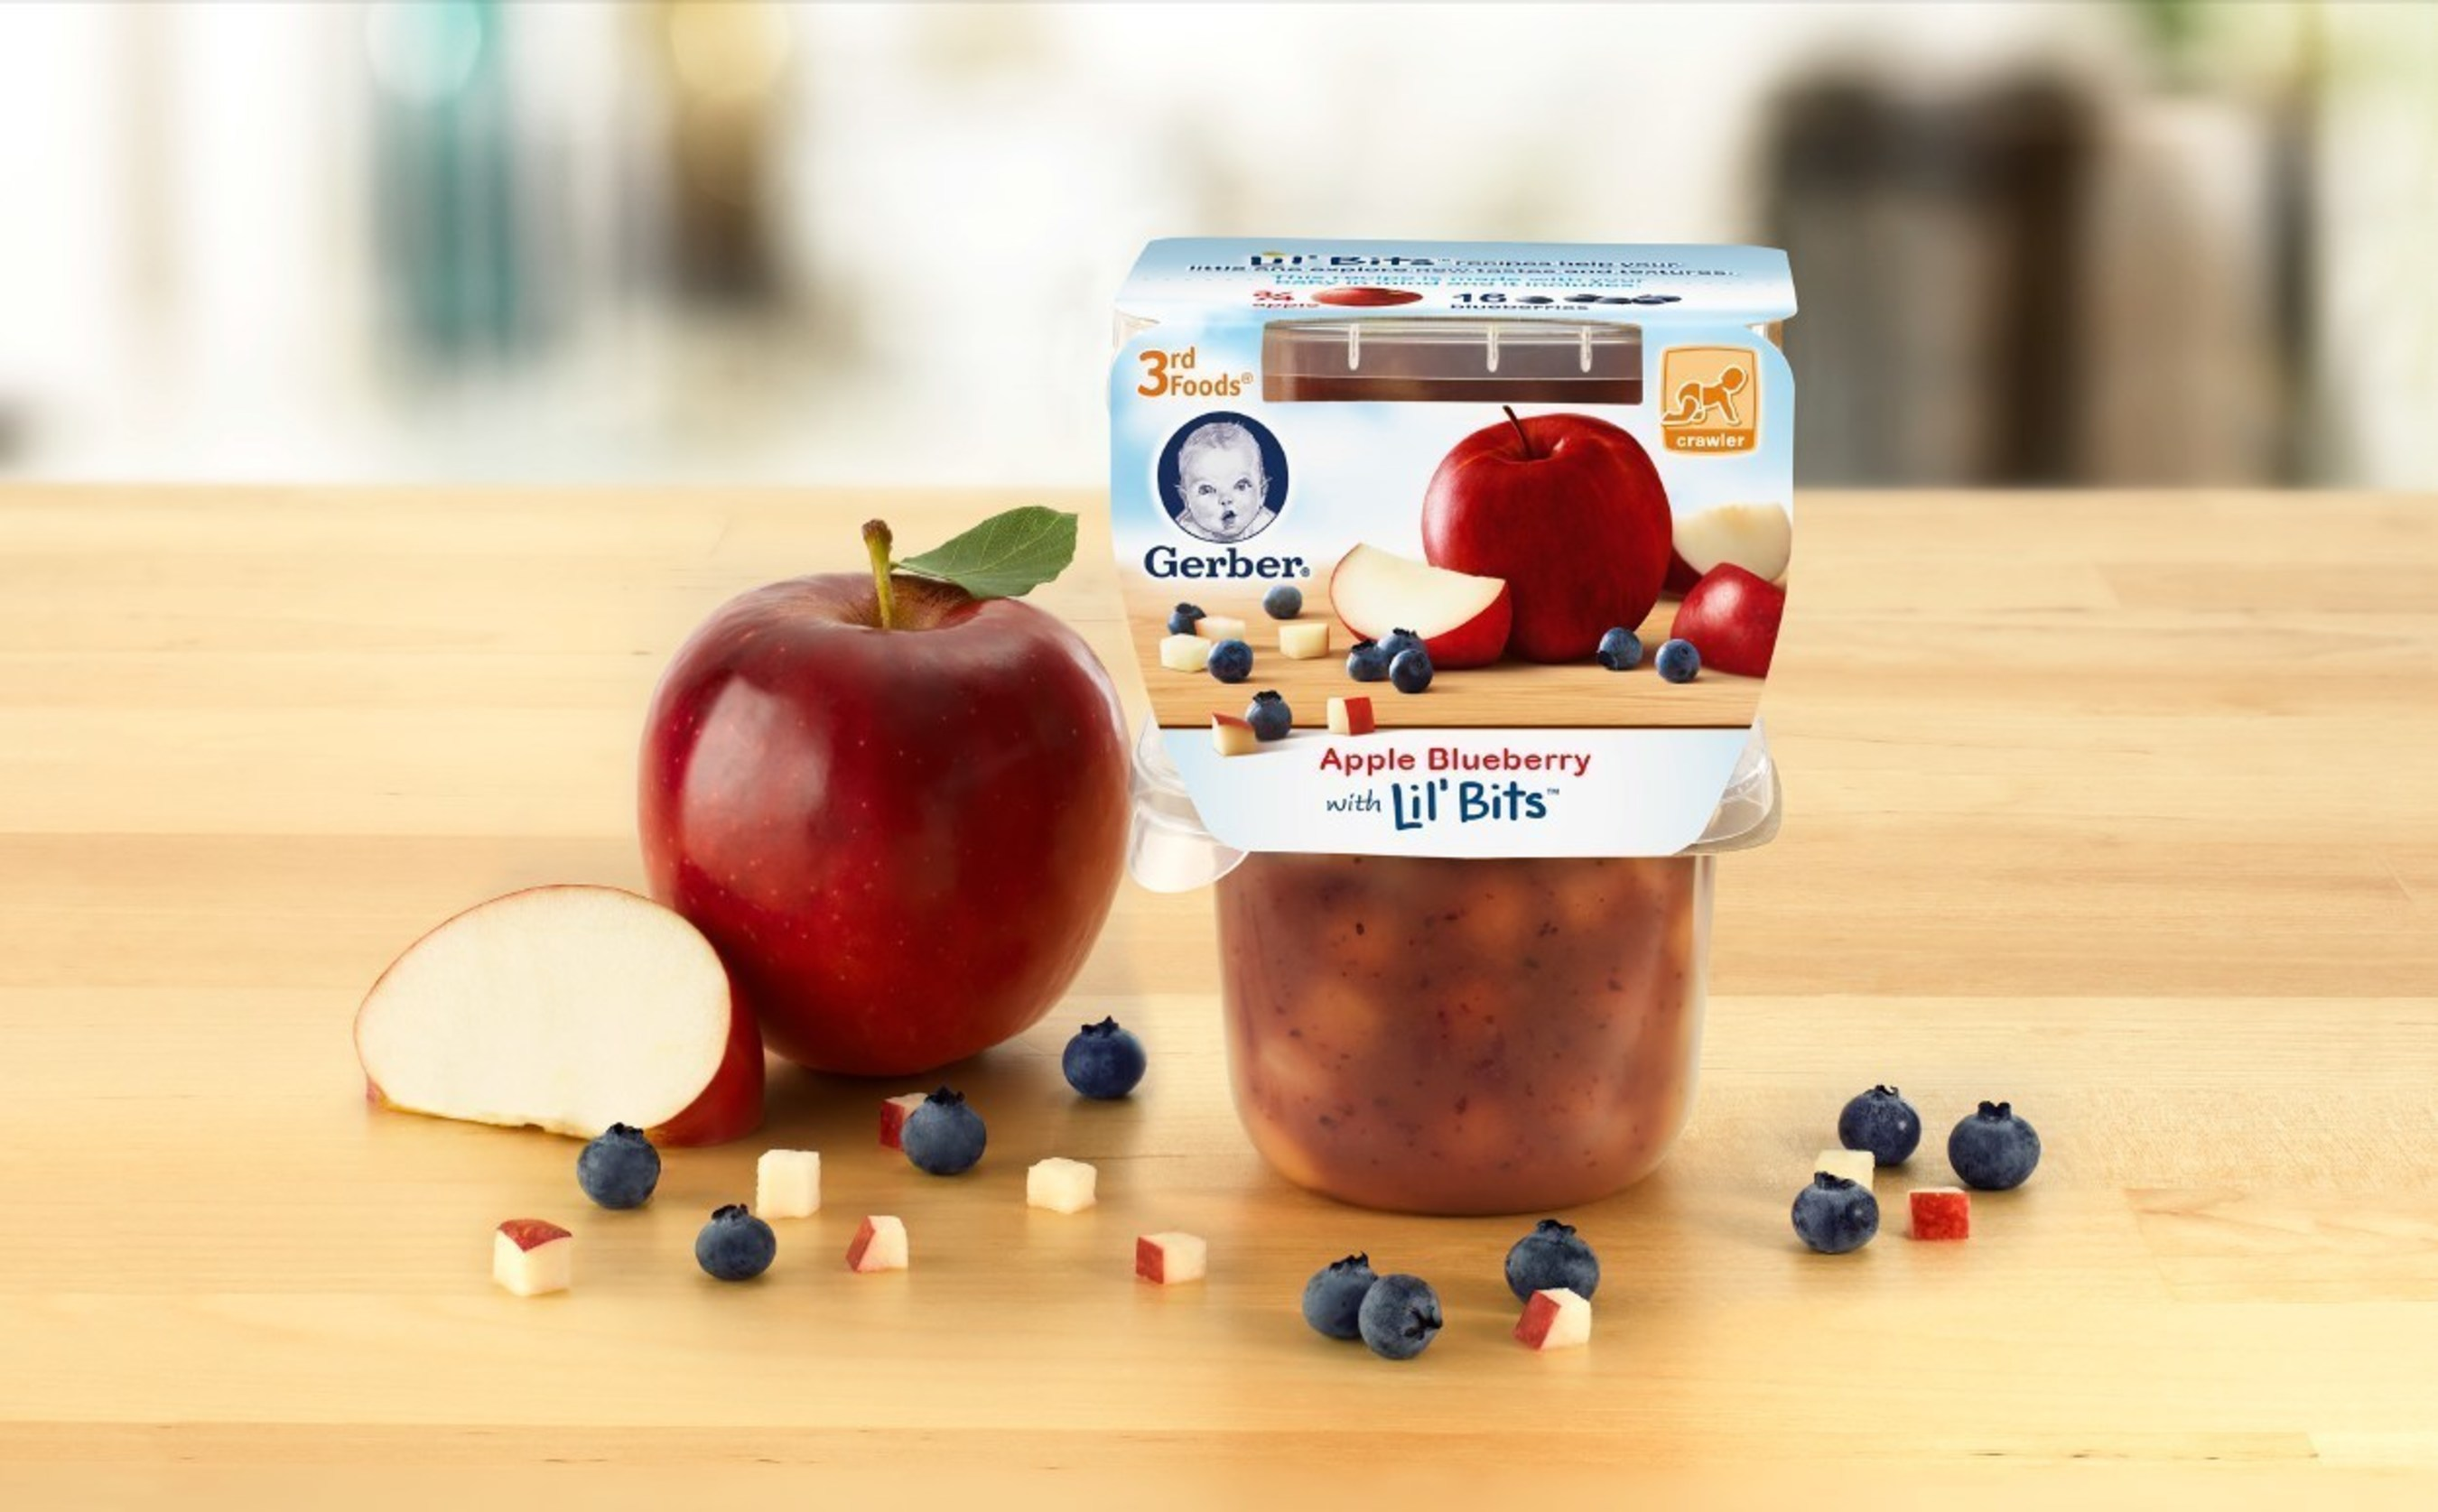 Gerber 3rd Foods(R) Lil' Bits(TM) Recipes -  Apple Blueberry